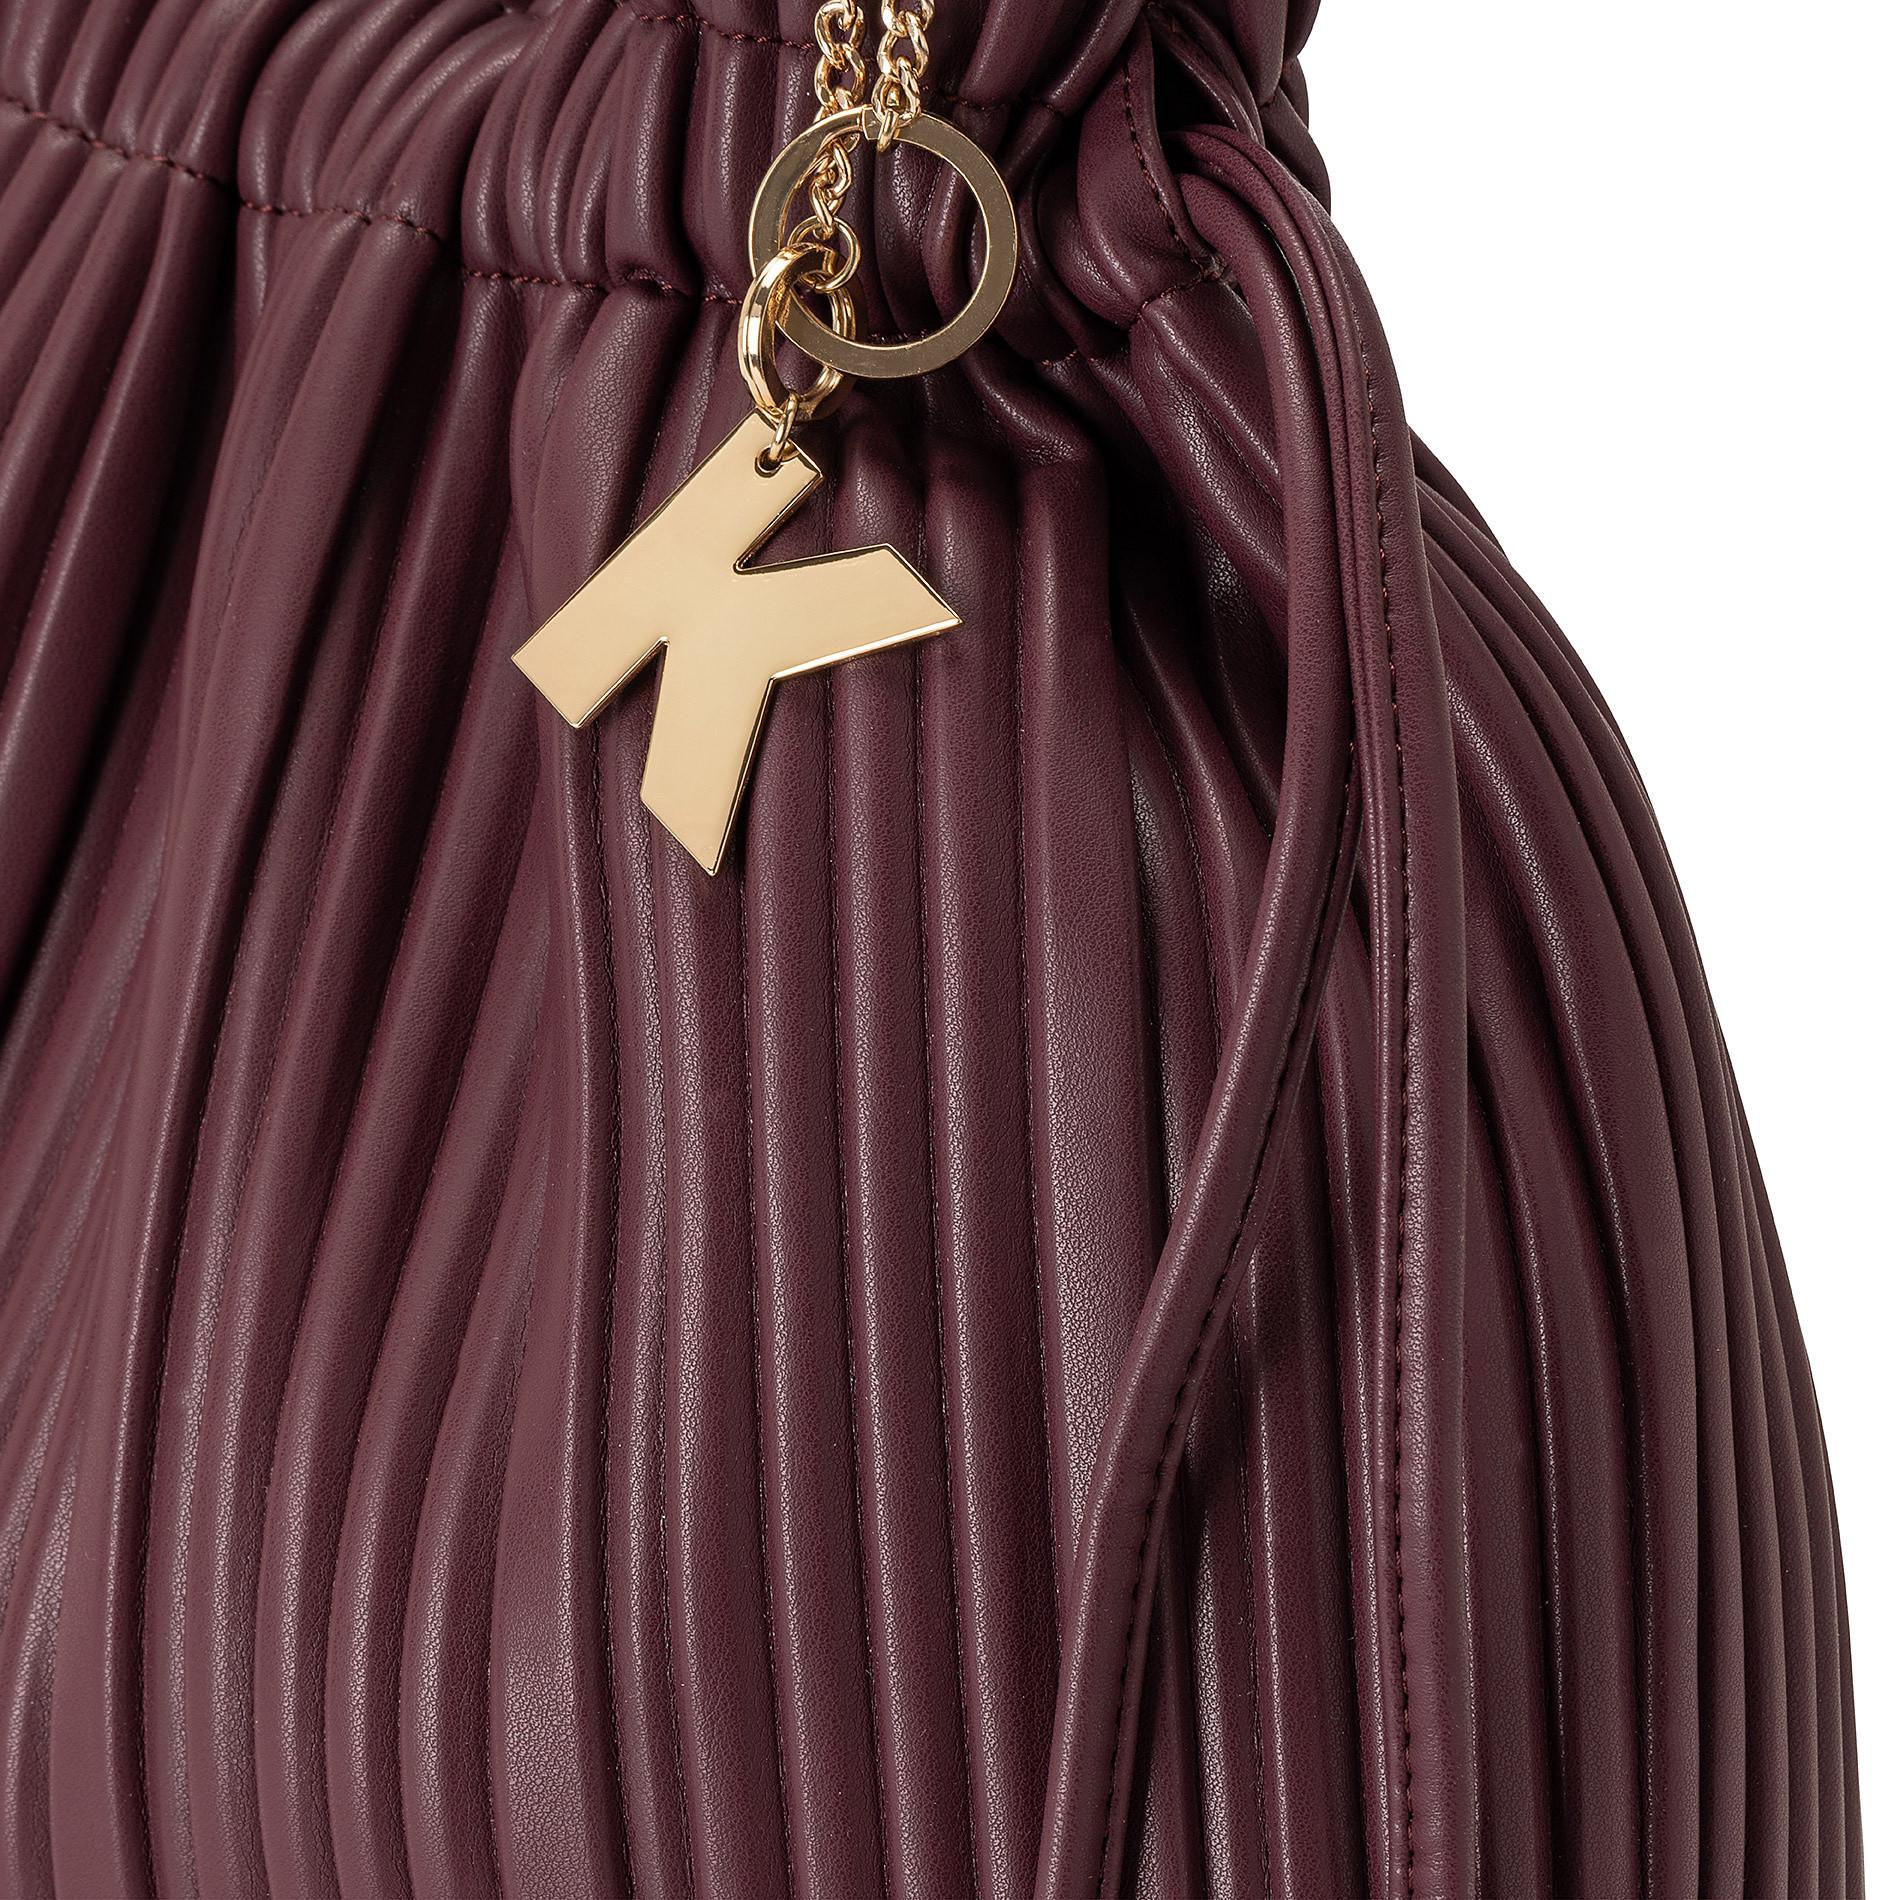 Borsa a tracolla tessuto plissè Koan, Rosso scuro, large image number 2